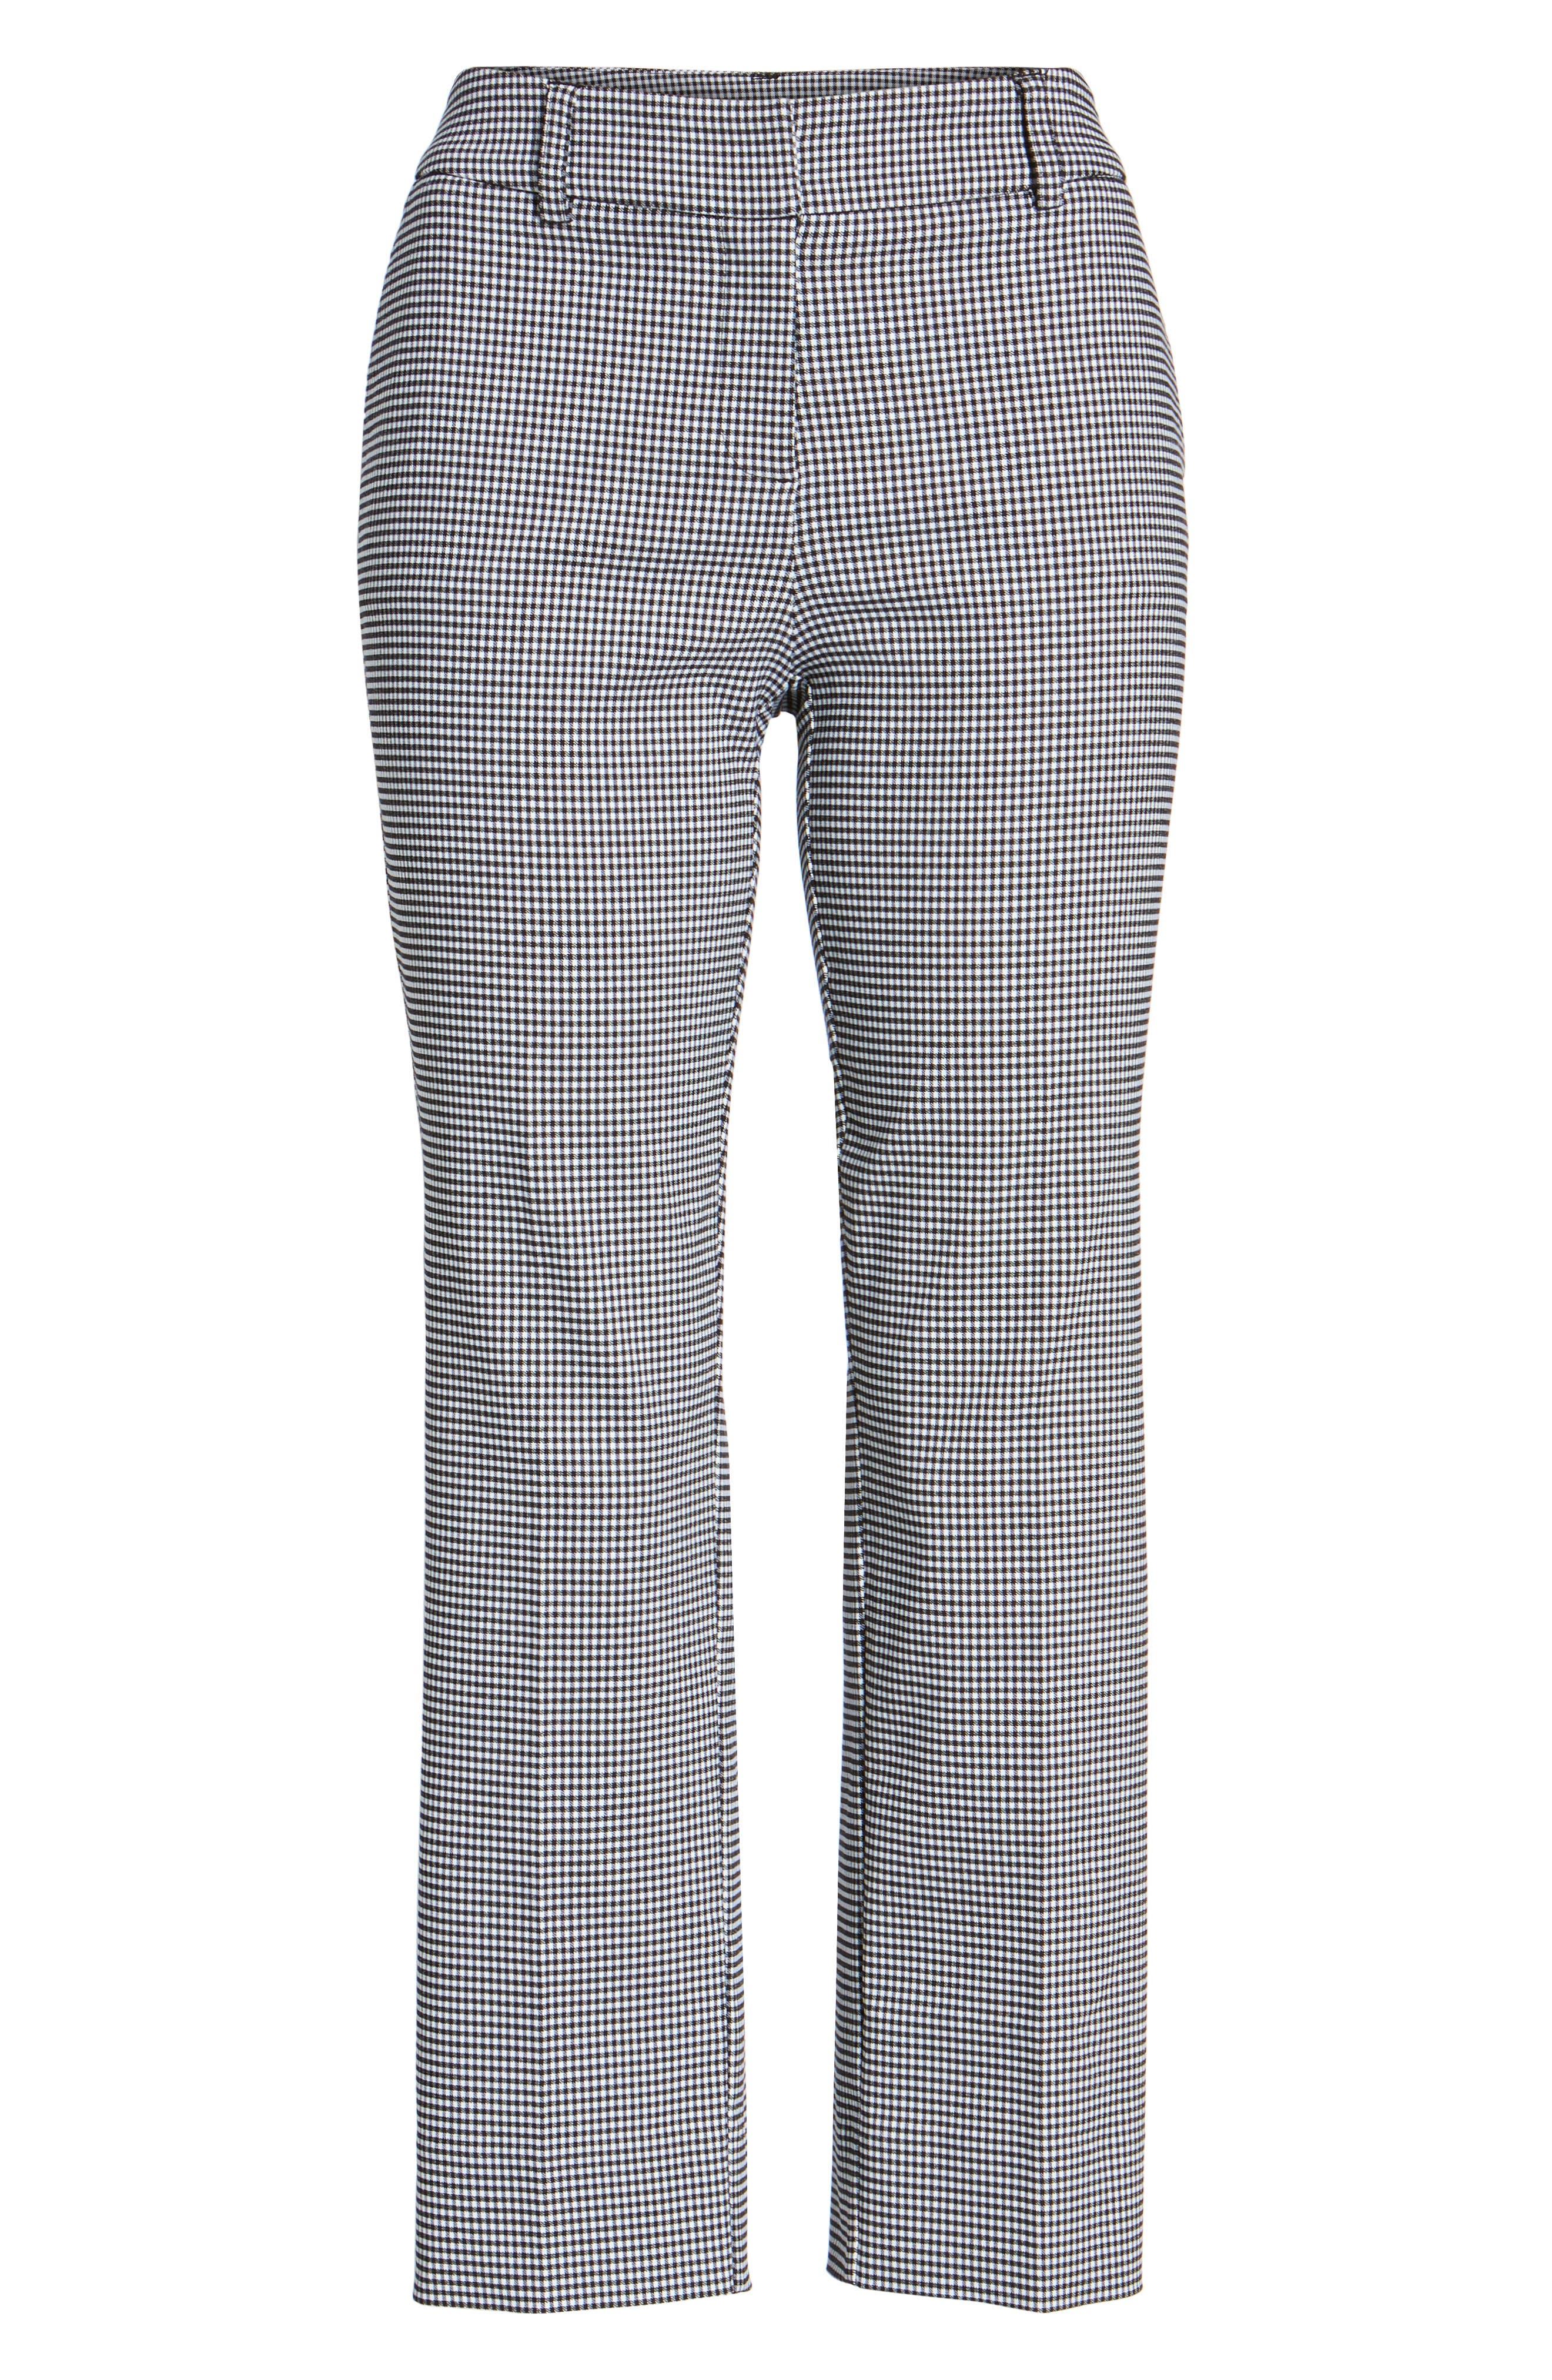 Crop Stretch Cotton Pants,                             Alternate thumbnail 3, color,                             Black- White Gingham